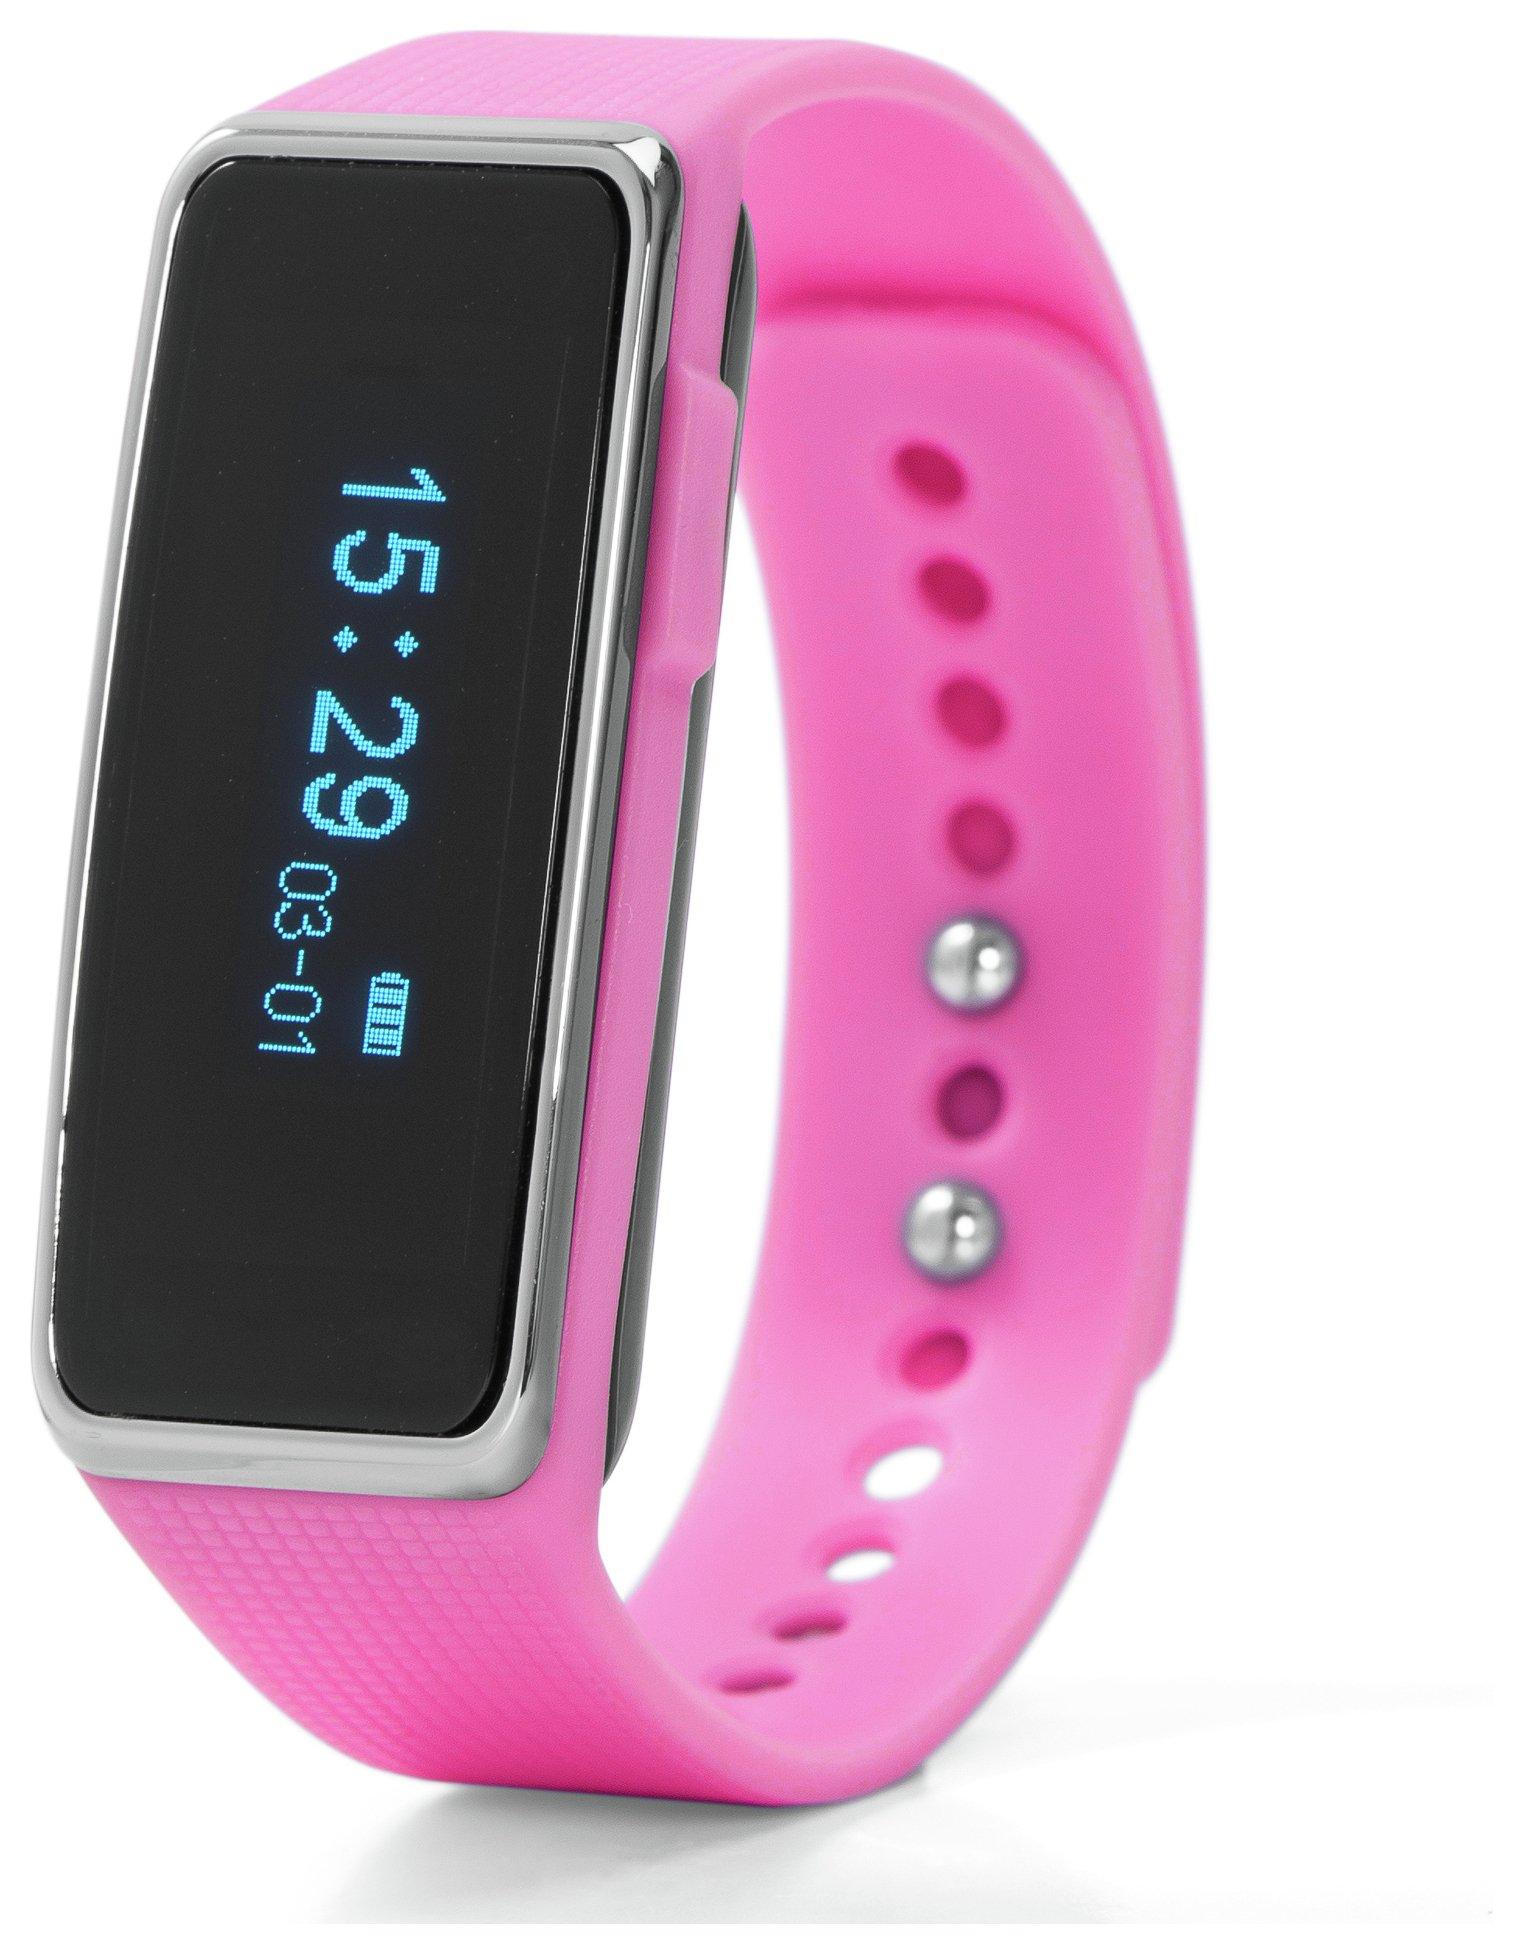 Nuband Activity Tracker - Pink